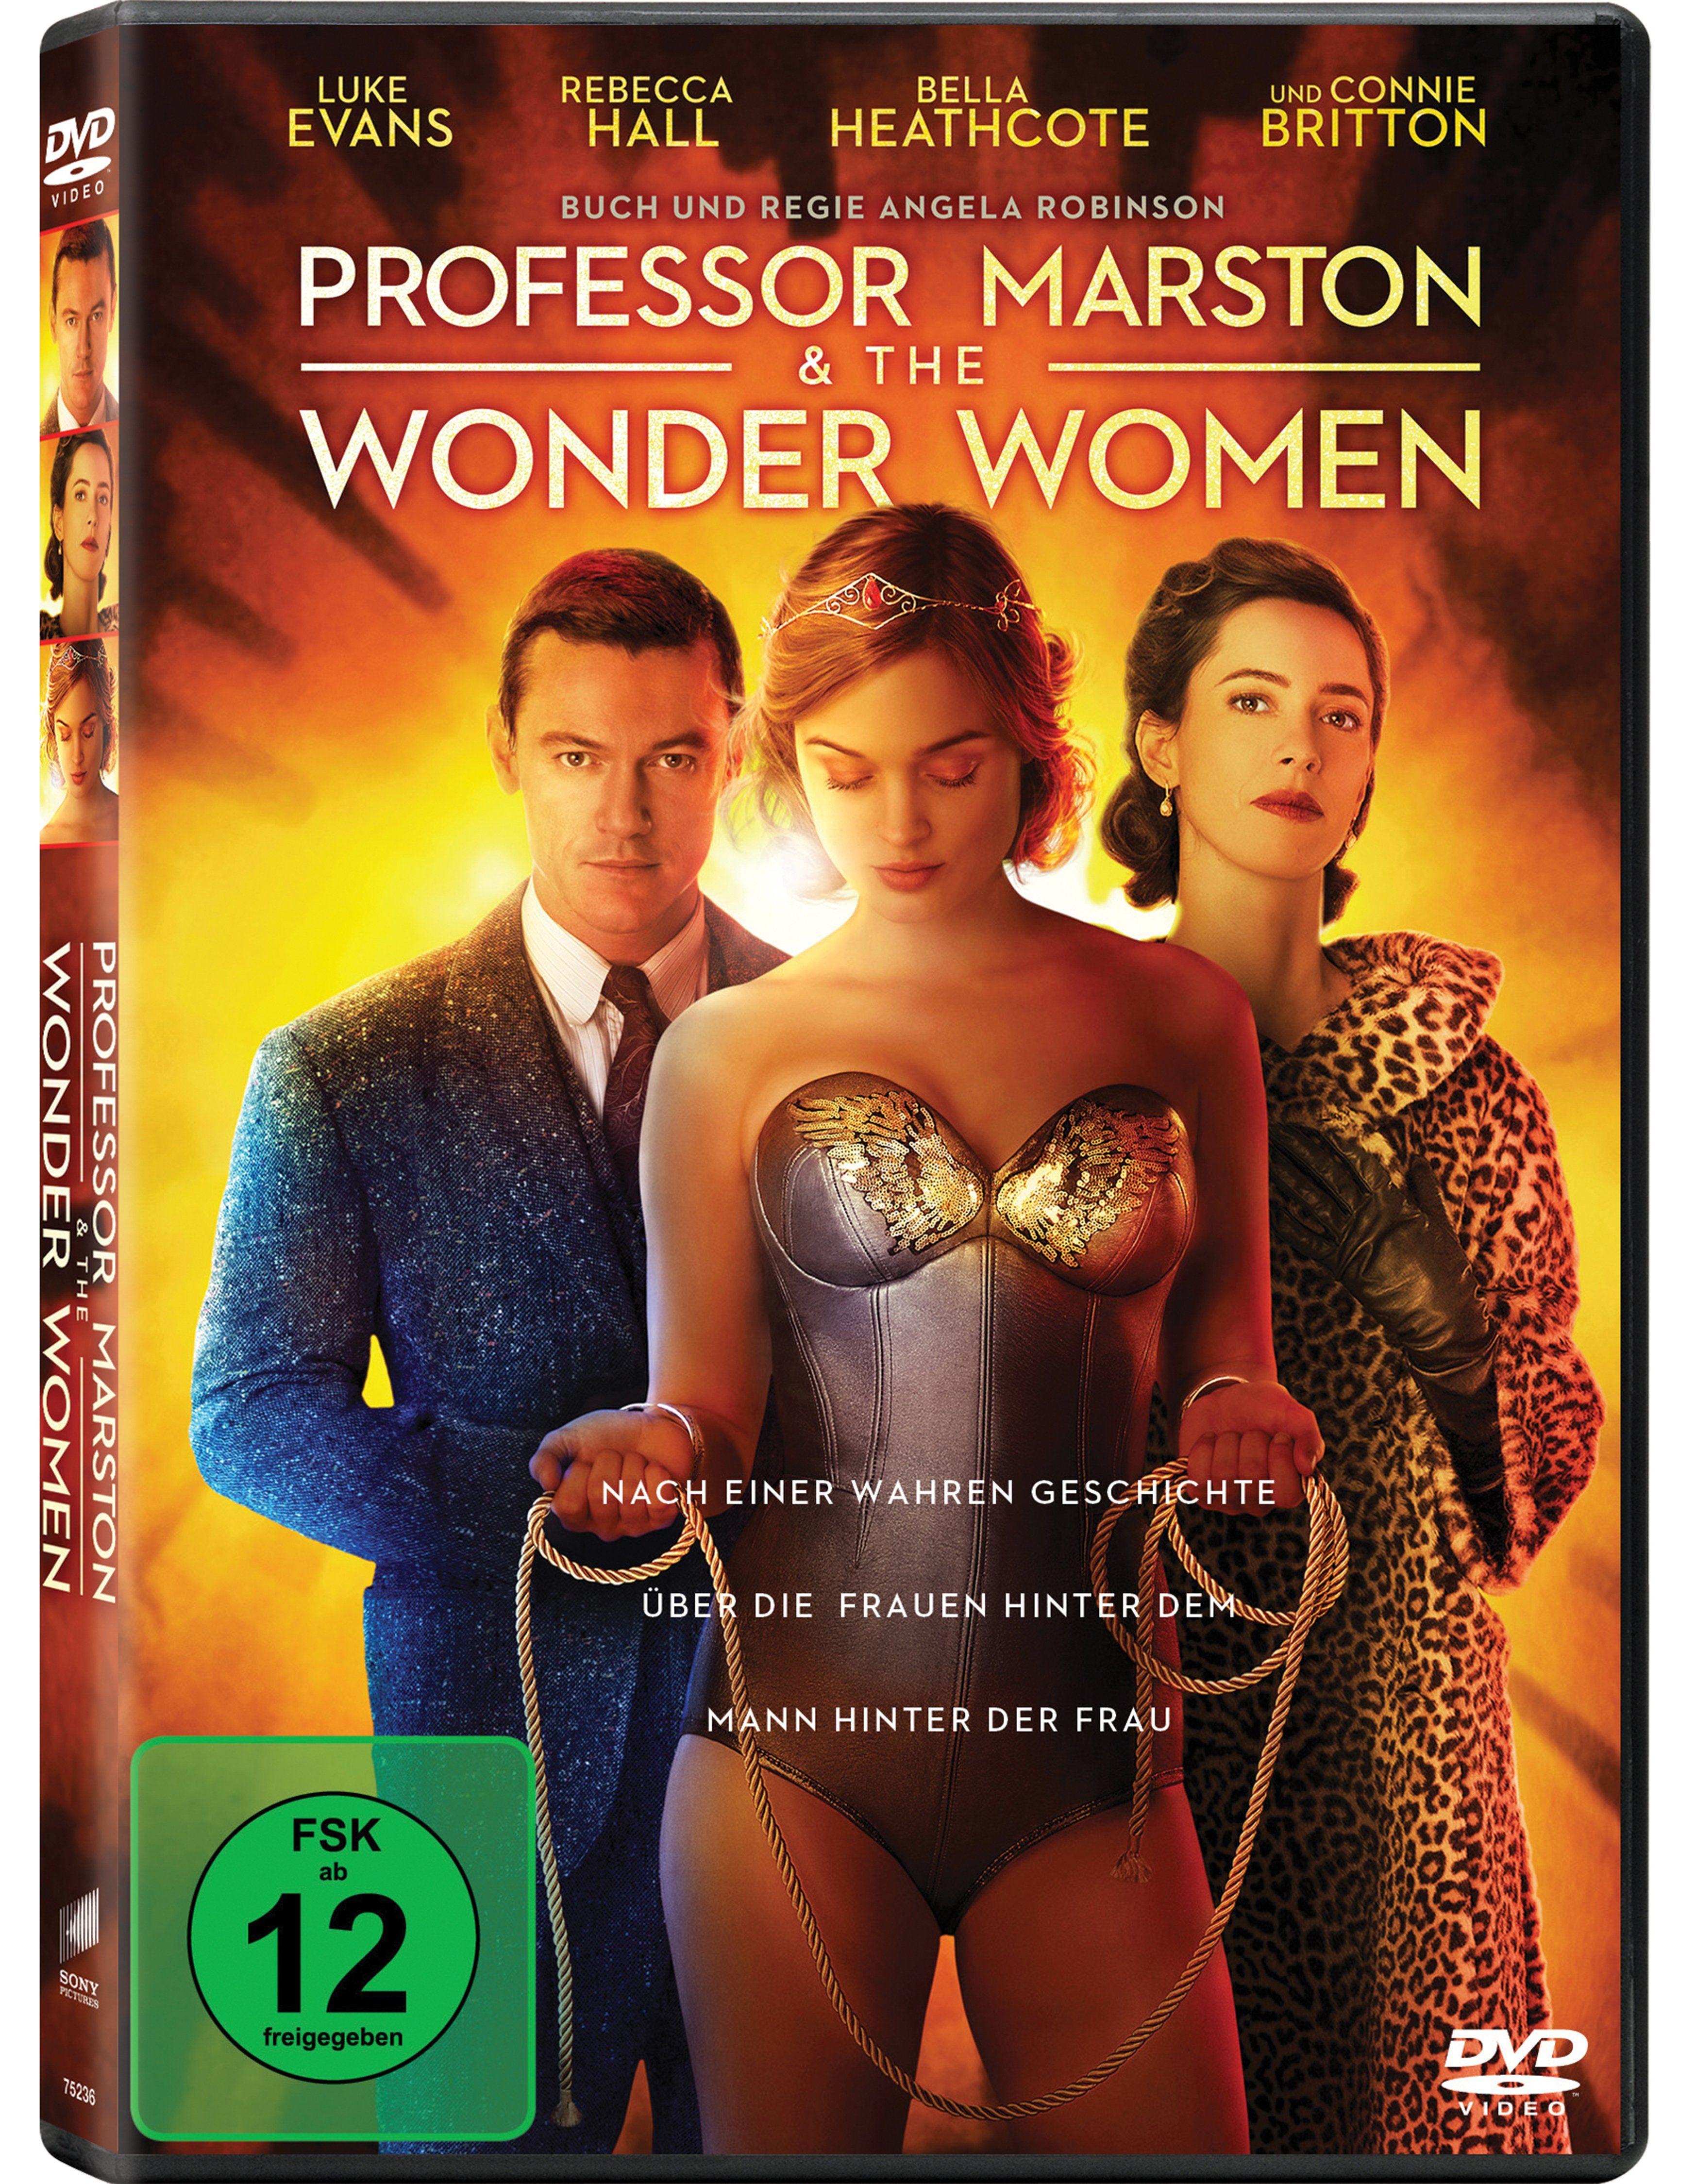 Sony Pictures DVD »Professor Marston & The Wonder Women«